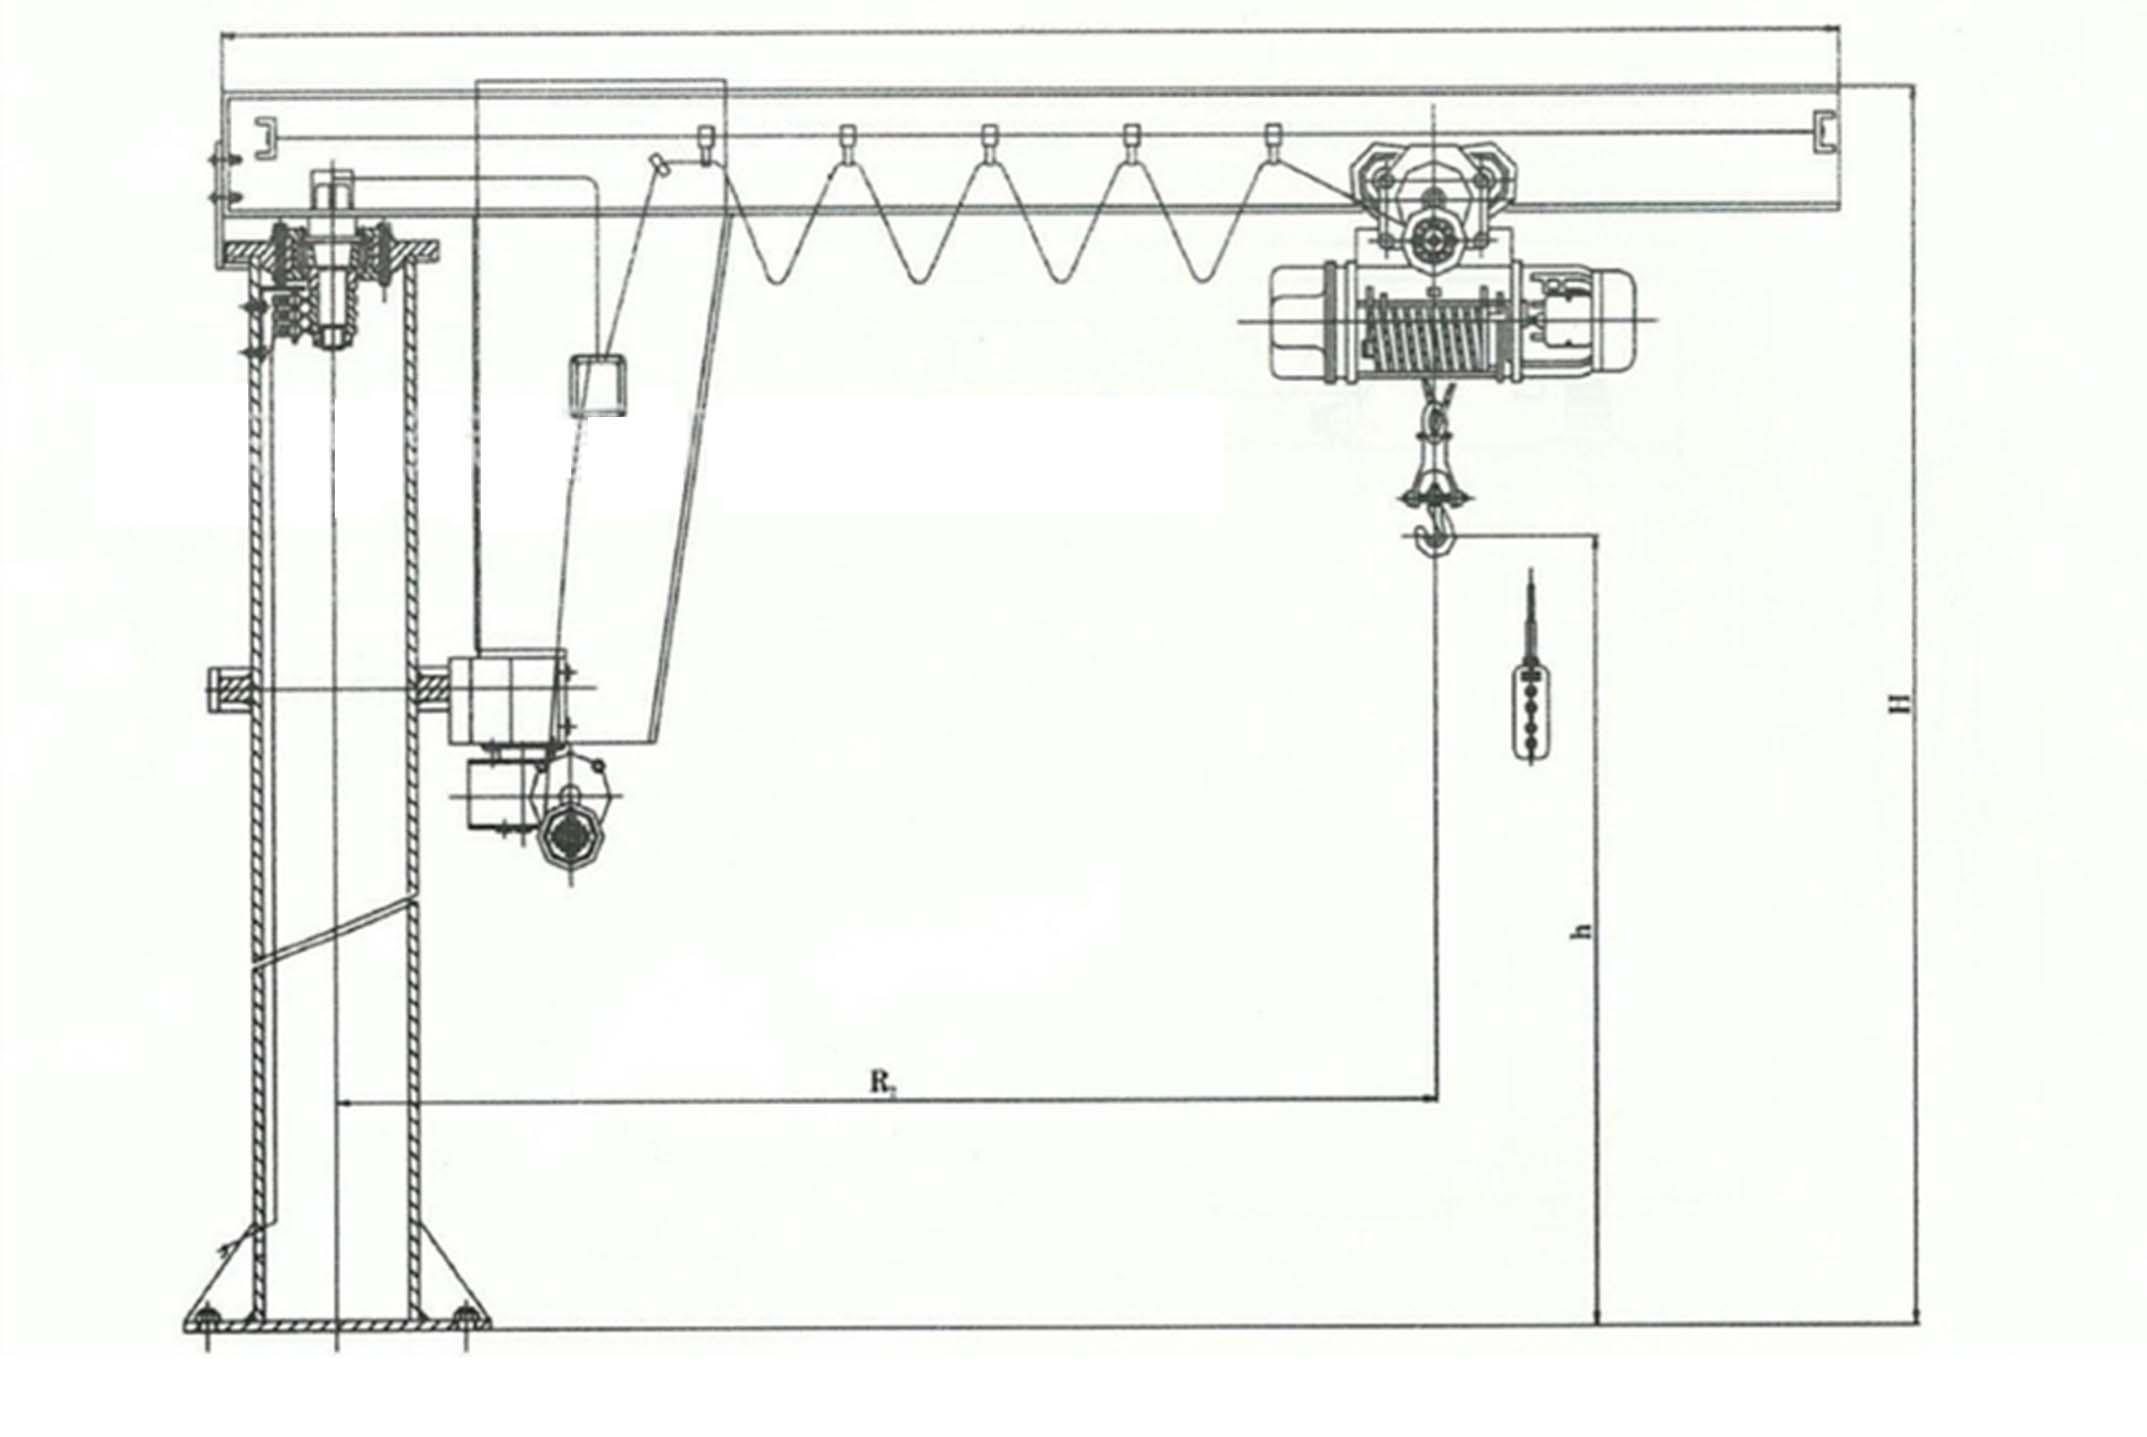 BZD型起重机,悬臂吊,悬臂起重机,定柱式起重机,起重机,定柱式悬臂起重机,定柱式悬臂吊<m met-id=26 met-table=product met-field=keywords></m>